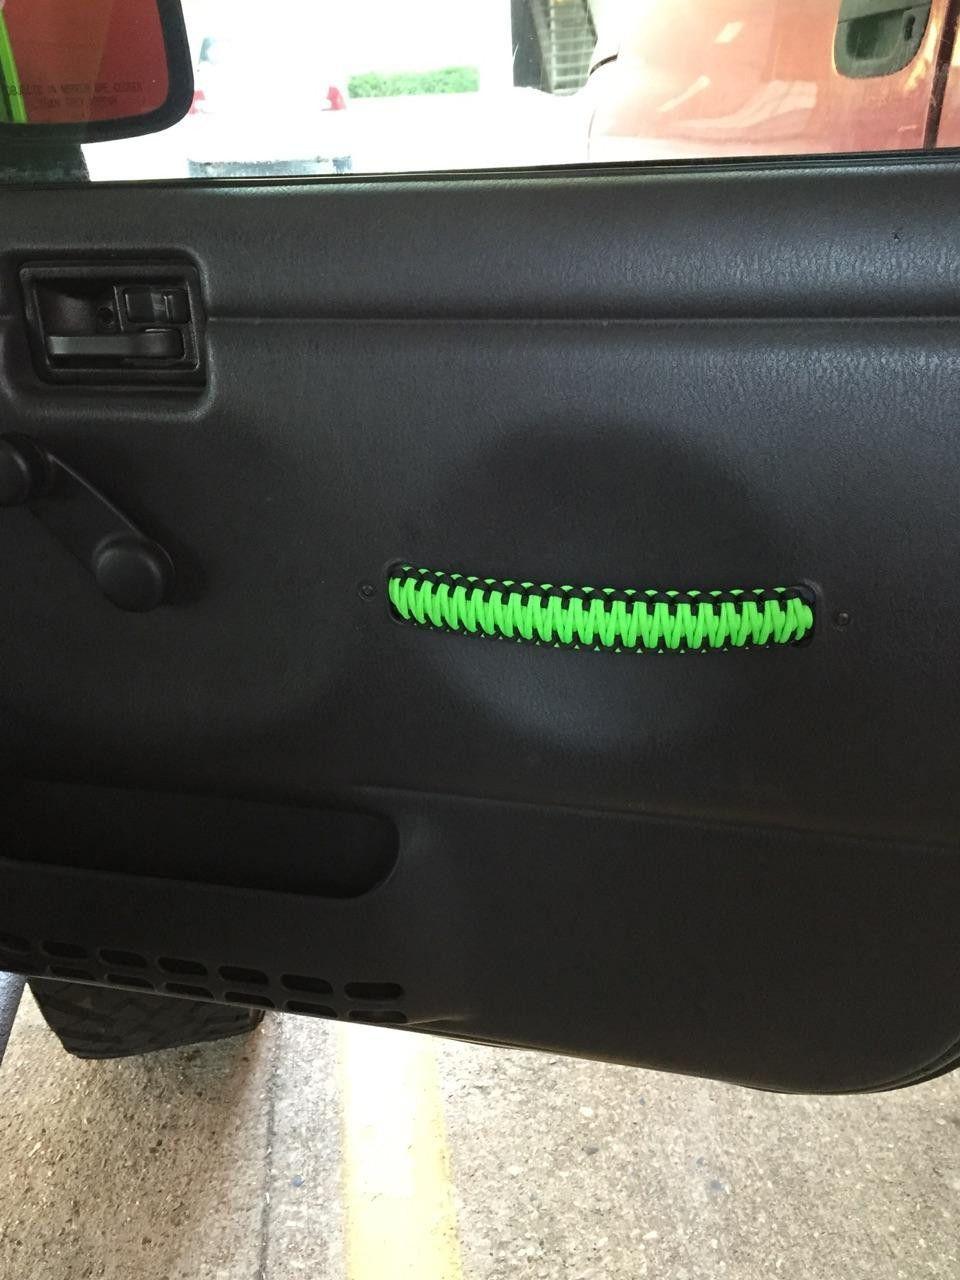 Jeep Wrangler Custom Door Handles For Your Tj S Lj S Yj S And Cj S Jeep Wrangler Accessories Custom Jeep Wrangler Jeep Wrangler Tj Accessories